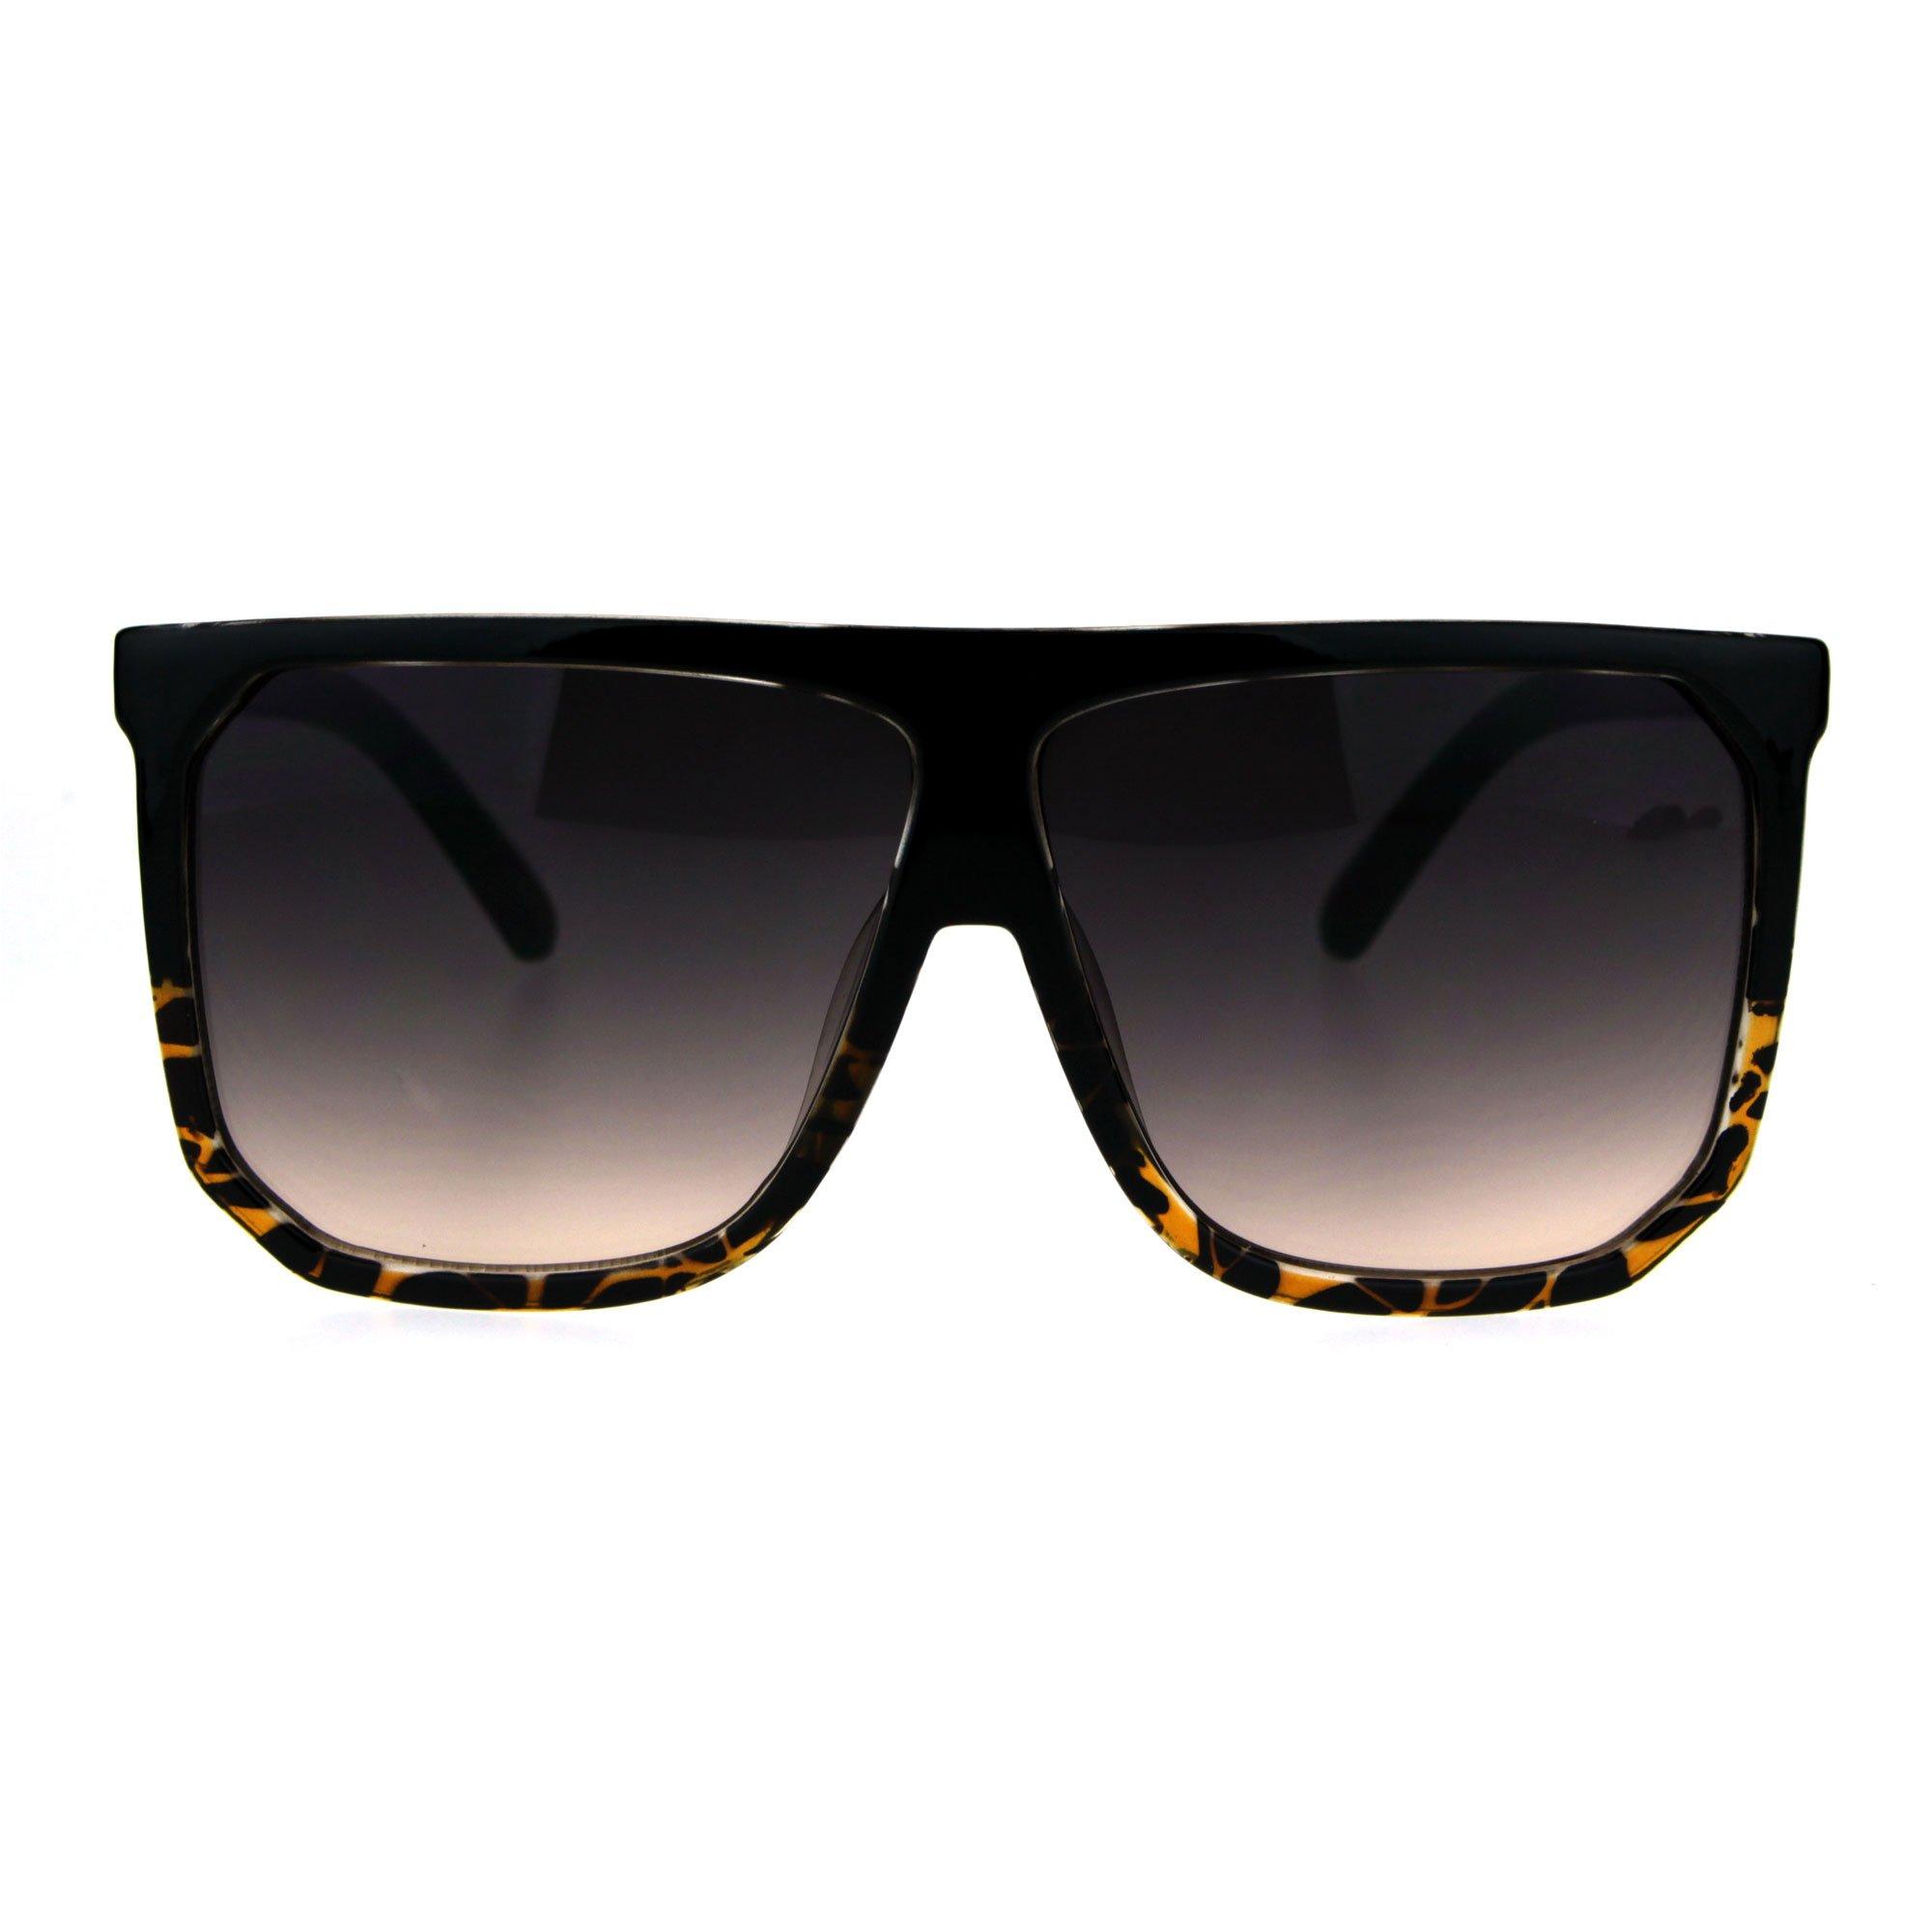 Oversized Style Sunglasses Flat Top Square Modern Fashion UV 400 Black/Tortoise